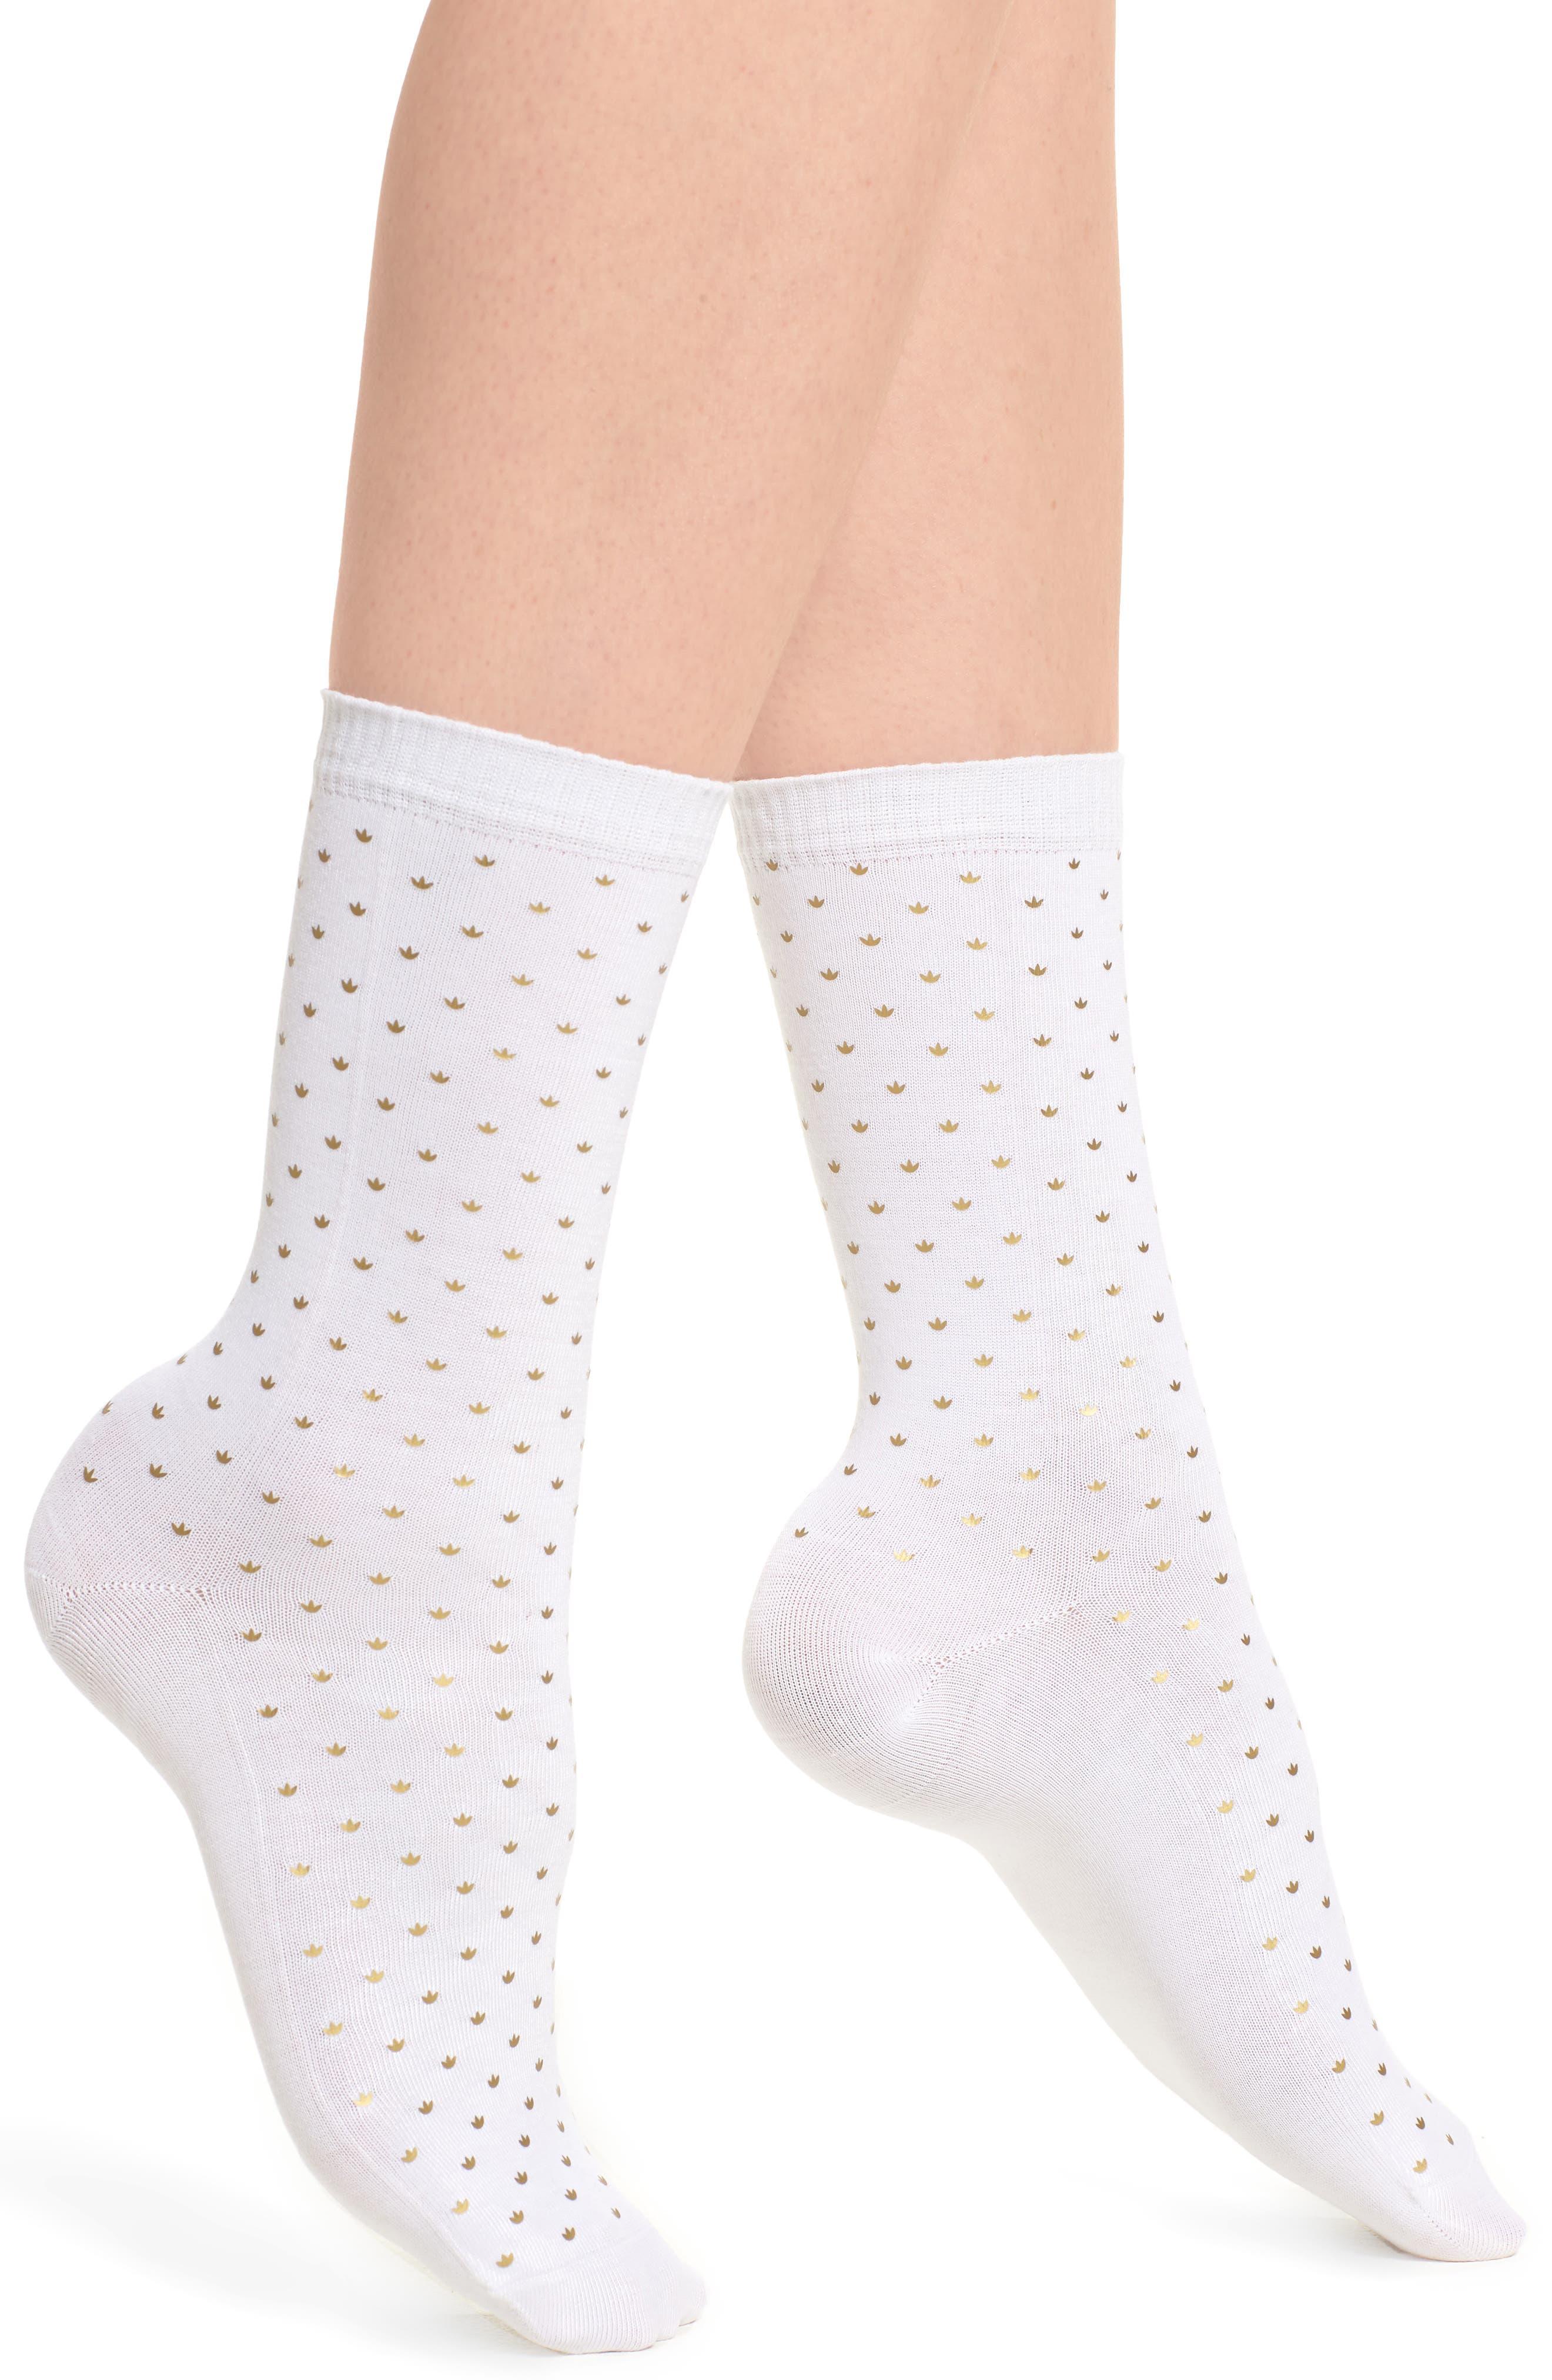 ADIDAS Mini Trefoil Crew Socks, Main, color, 100